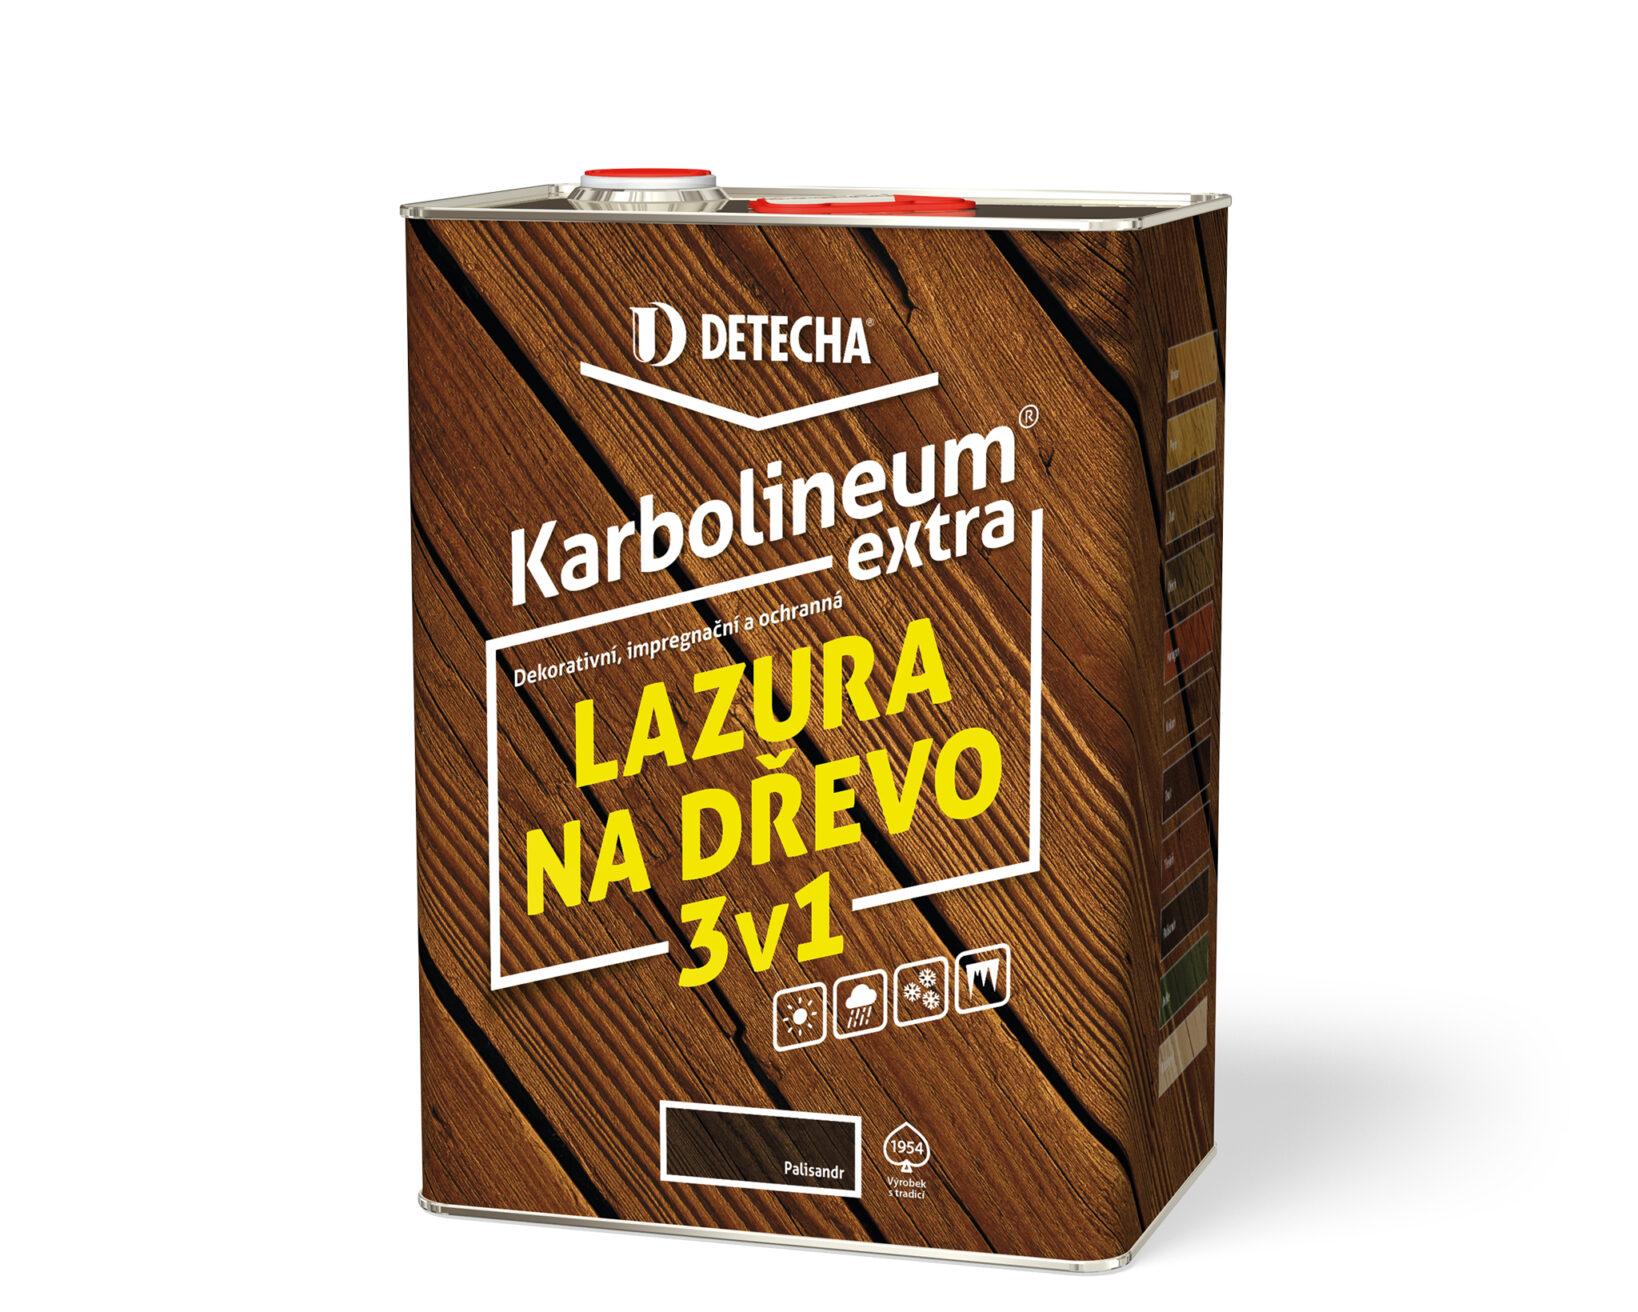 Detecha Karbolineum extra 8 kg